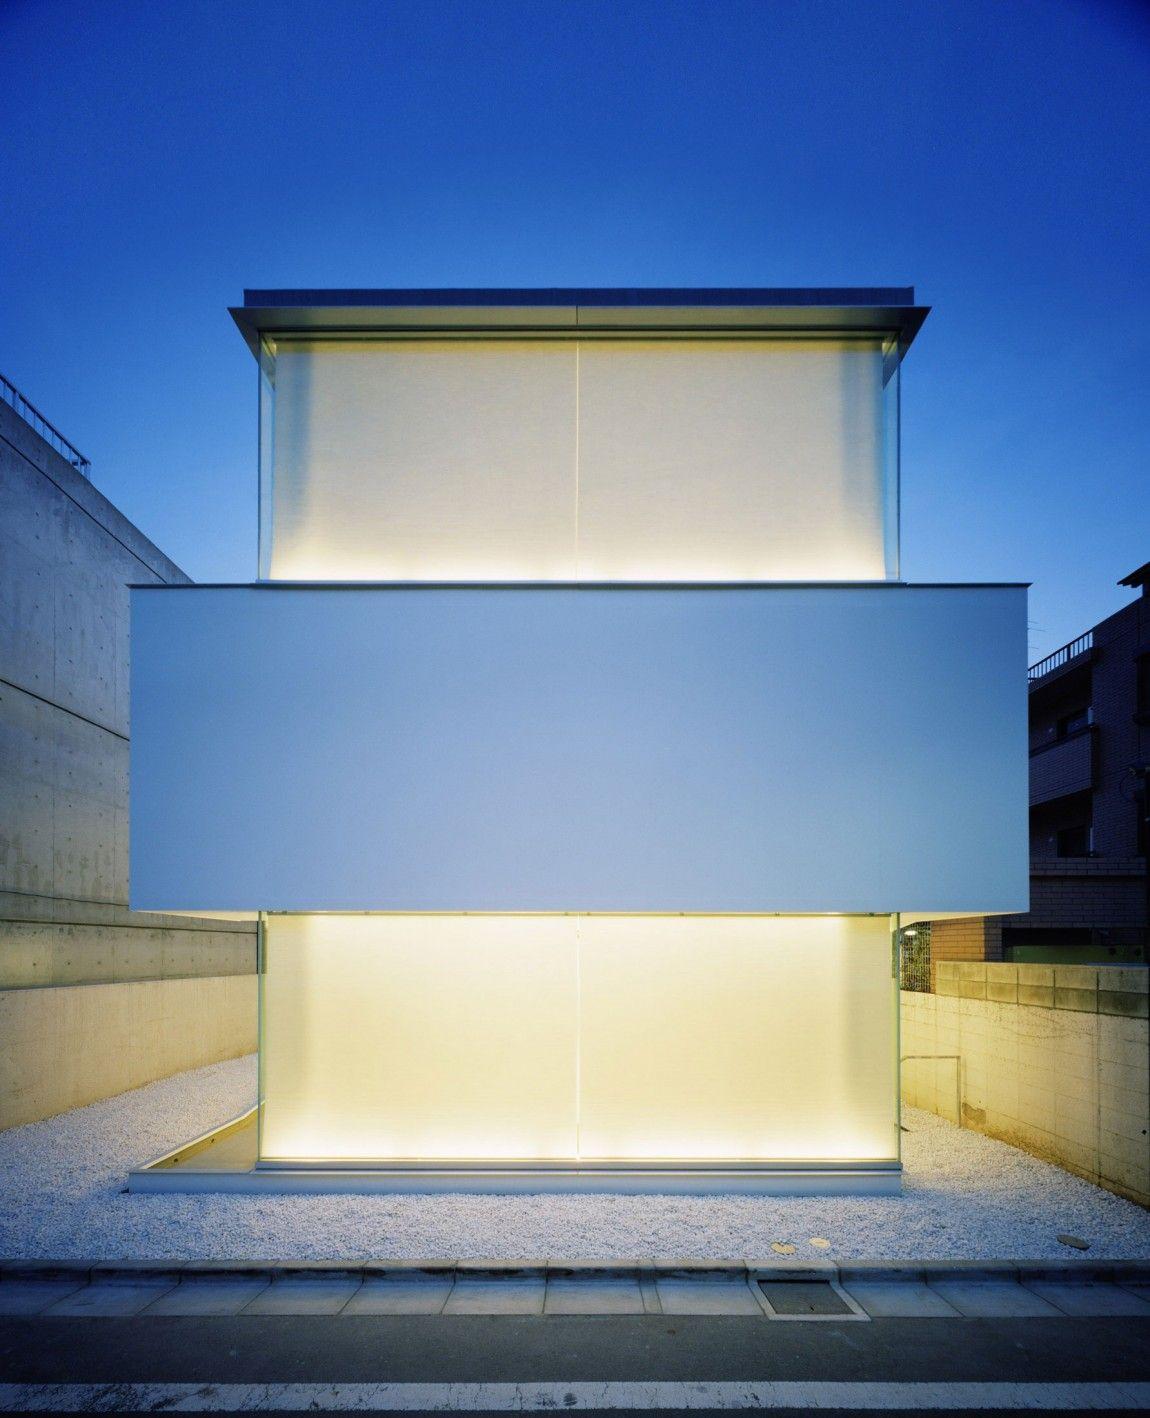 Gwenael Nicolas – Curiosity + Tomoyuki Ustumi – Milligram Studio / C1 house, Tokyo, Japan, 2005